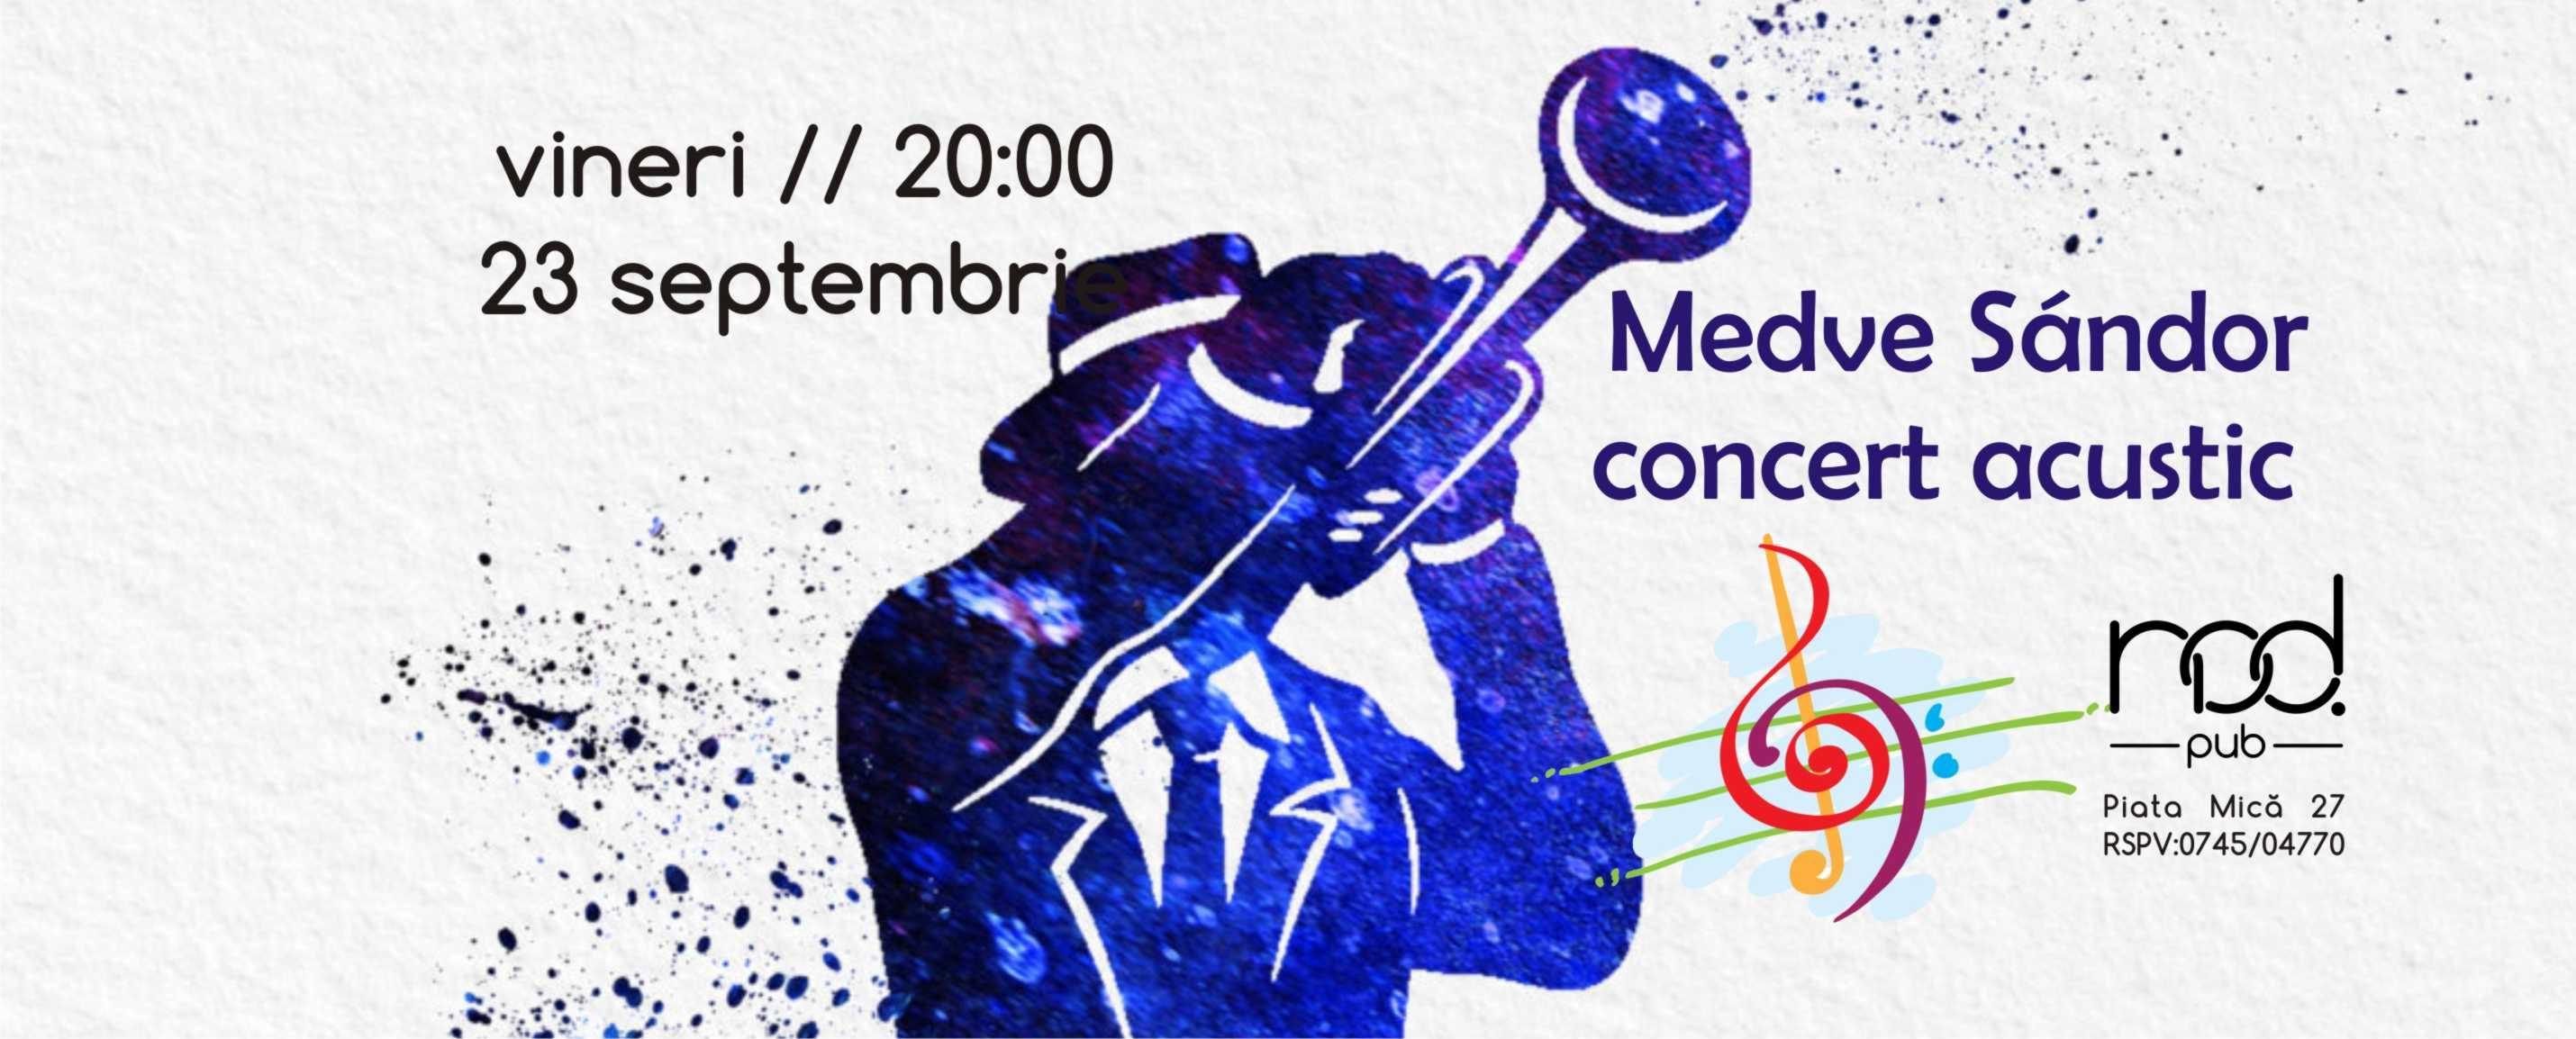 Concert acustic cu Medve Sandor **trumpet&loop**